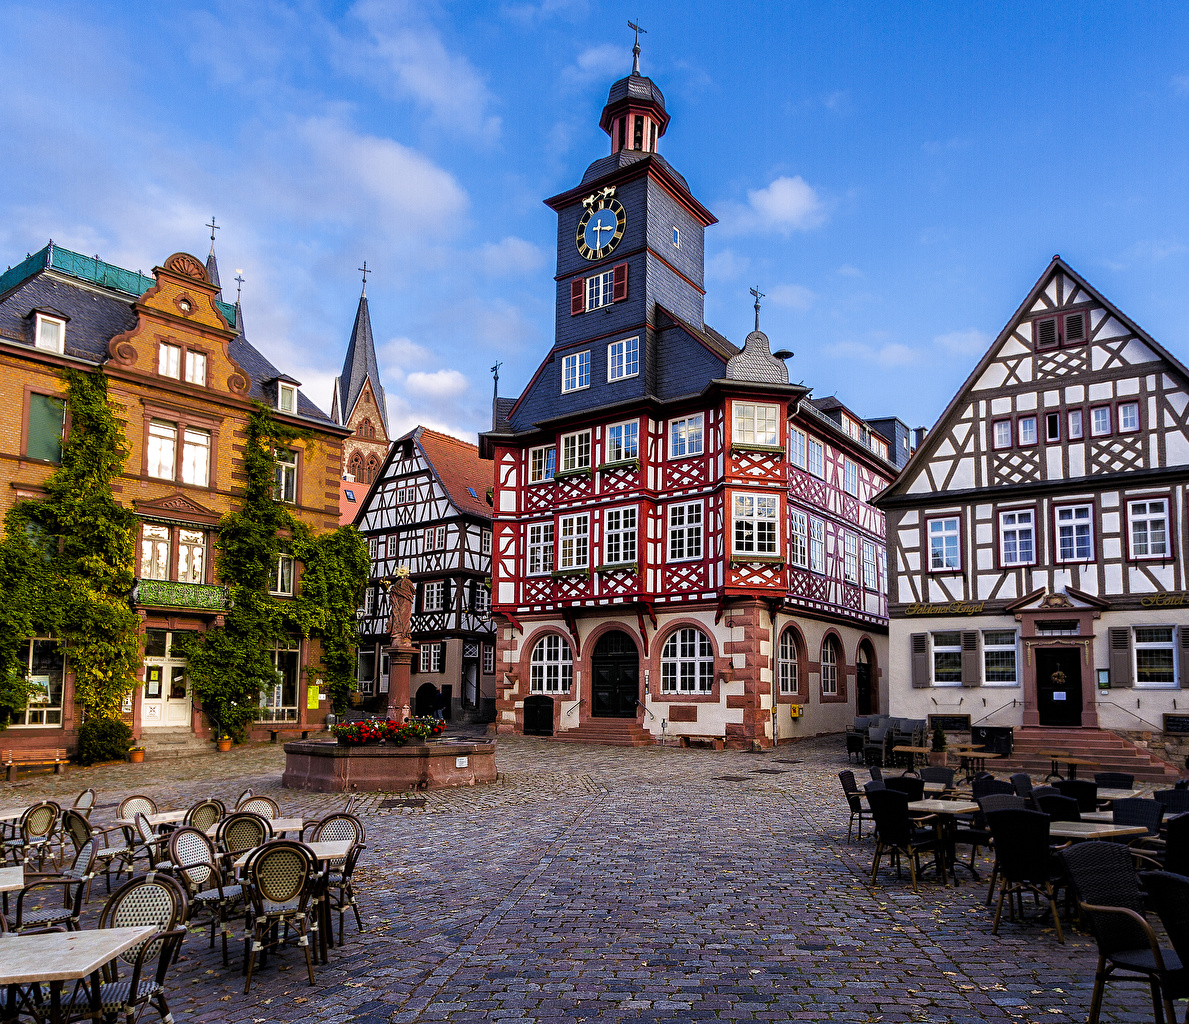 Фото Германия Heppenheim Кафе Дома Города Здания